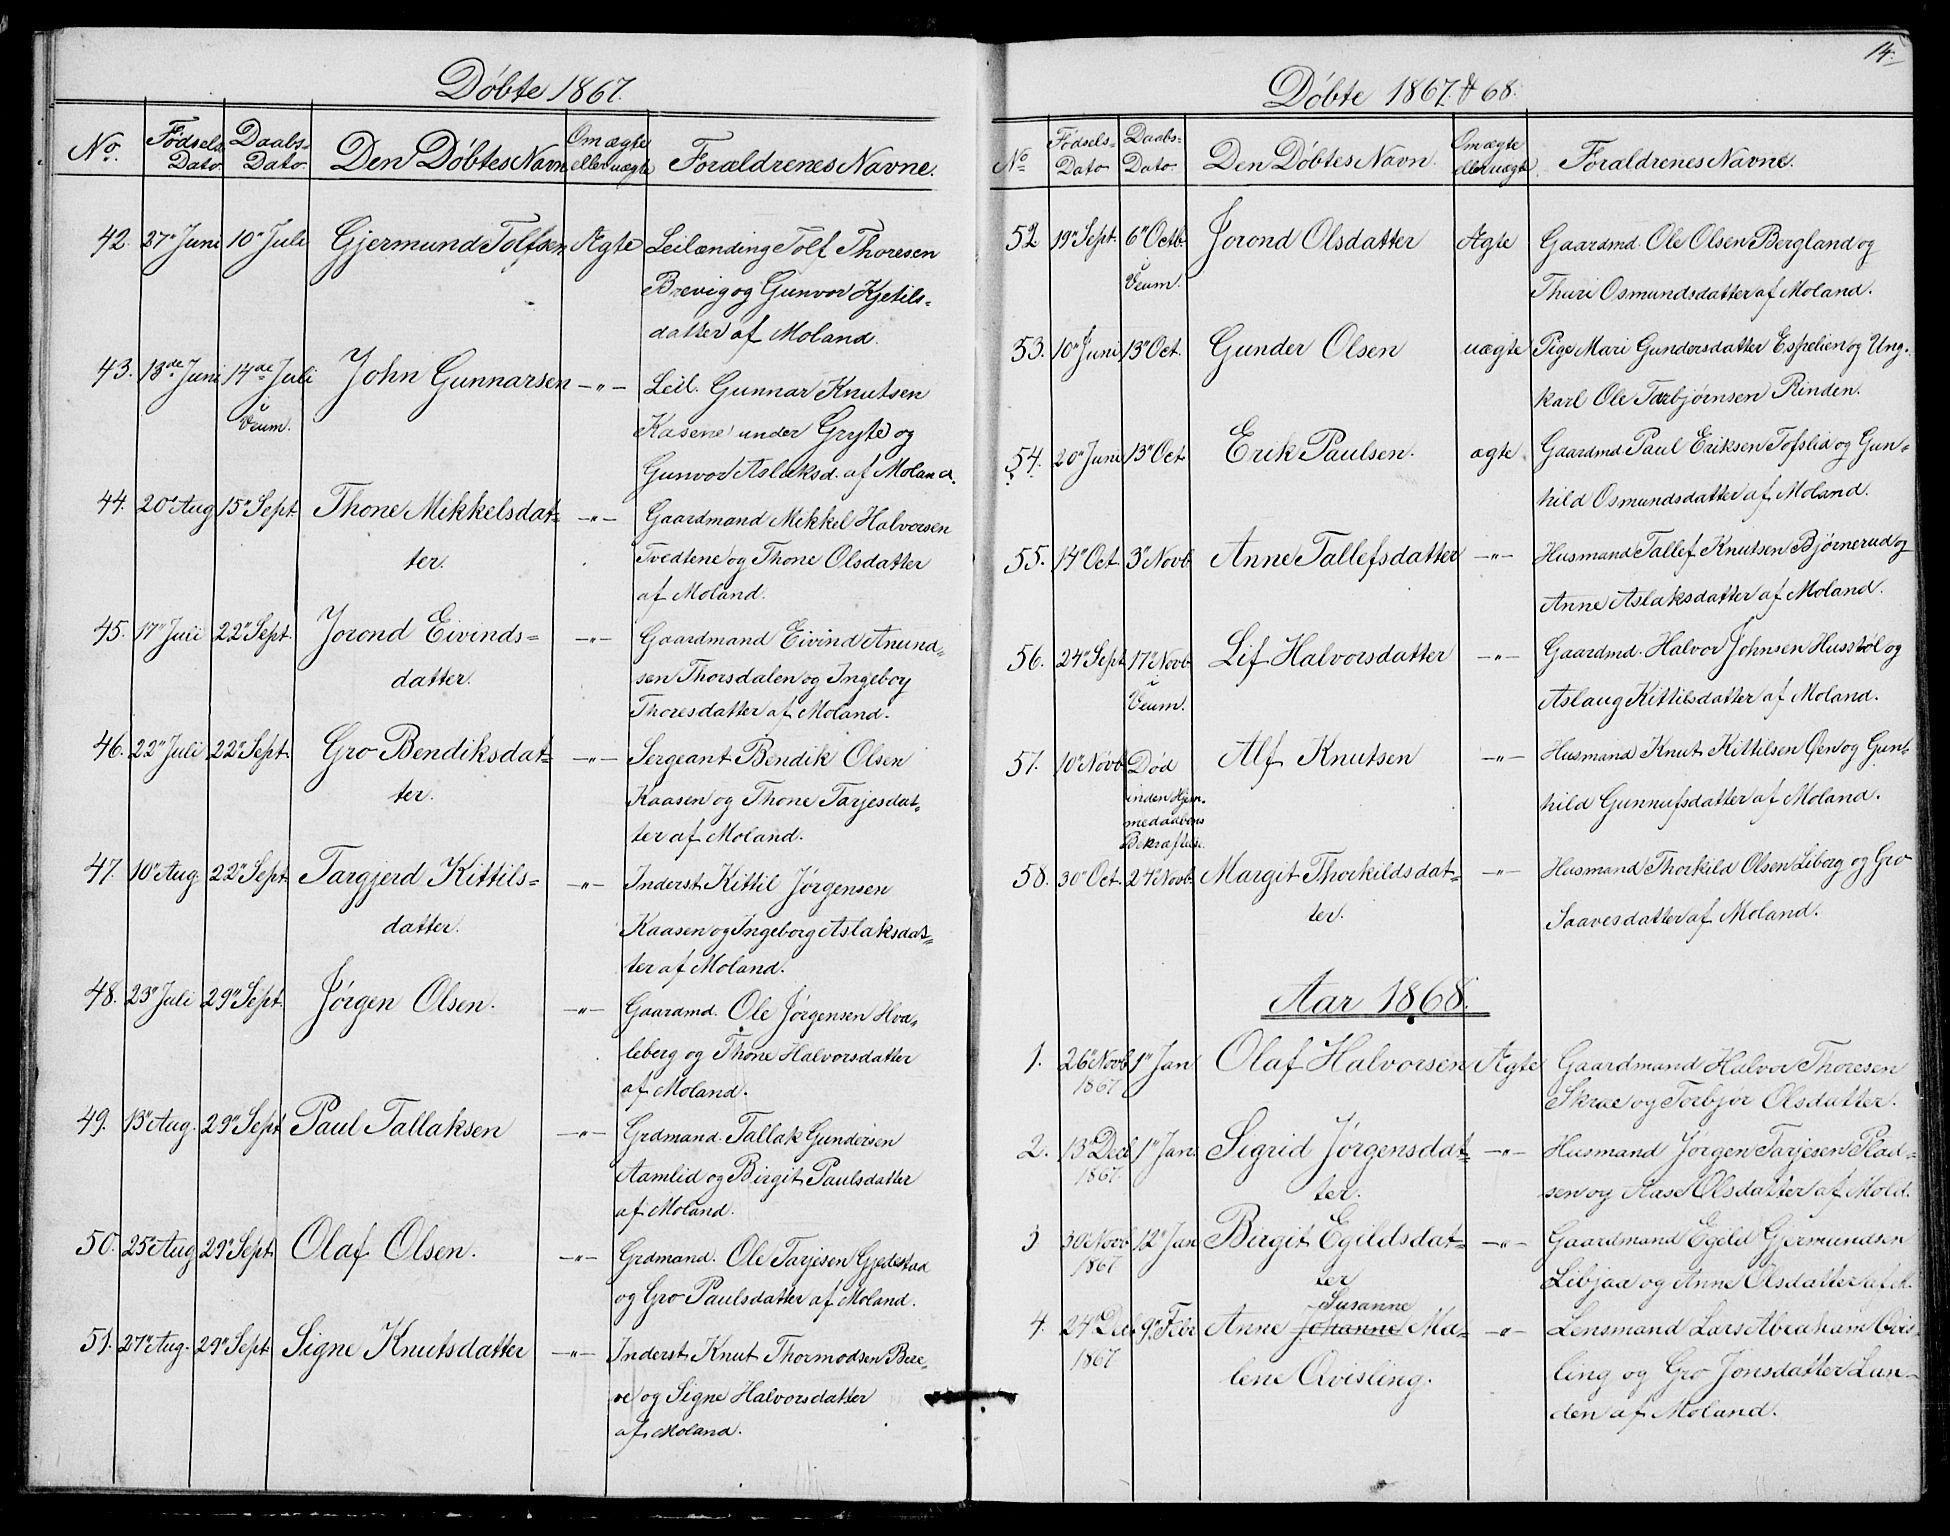 SAKO, Fyresdal kirkebøker, G/Ga/L0004: Parish register (copy) no. I 4, 1864-1892, p. 14